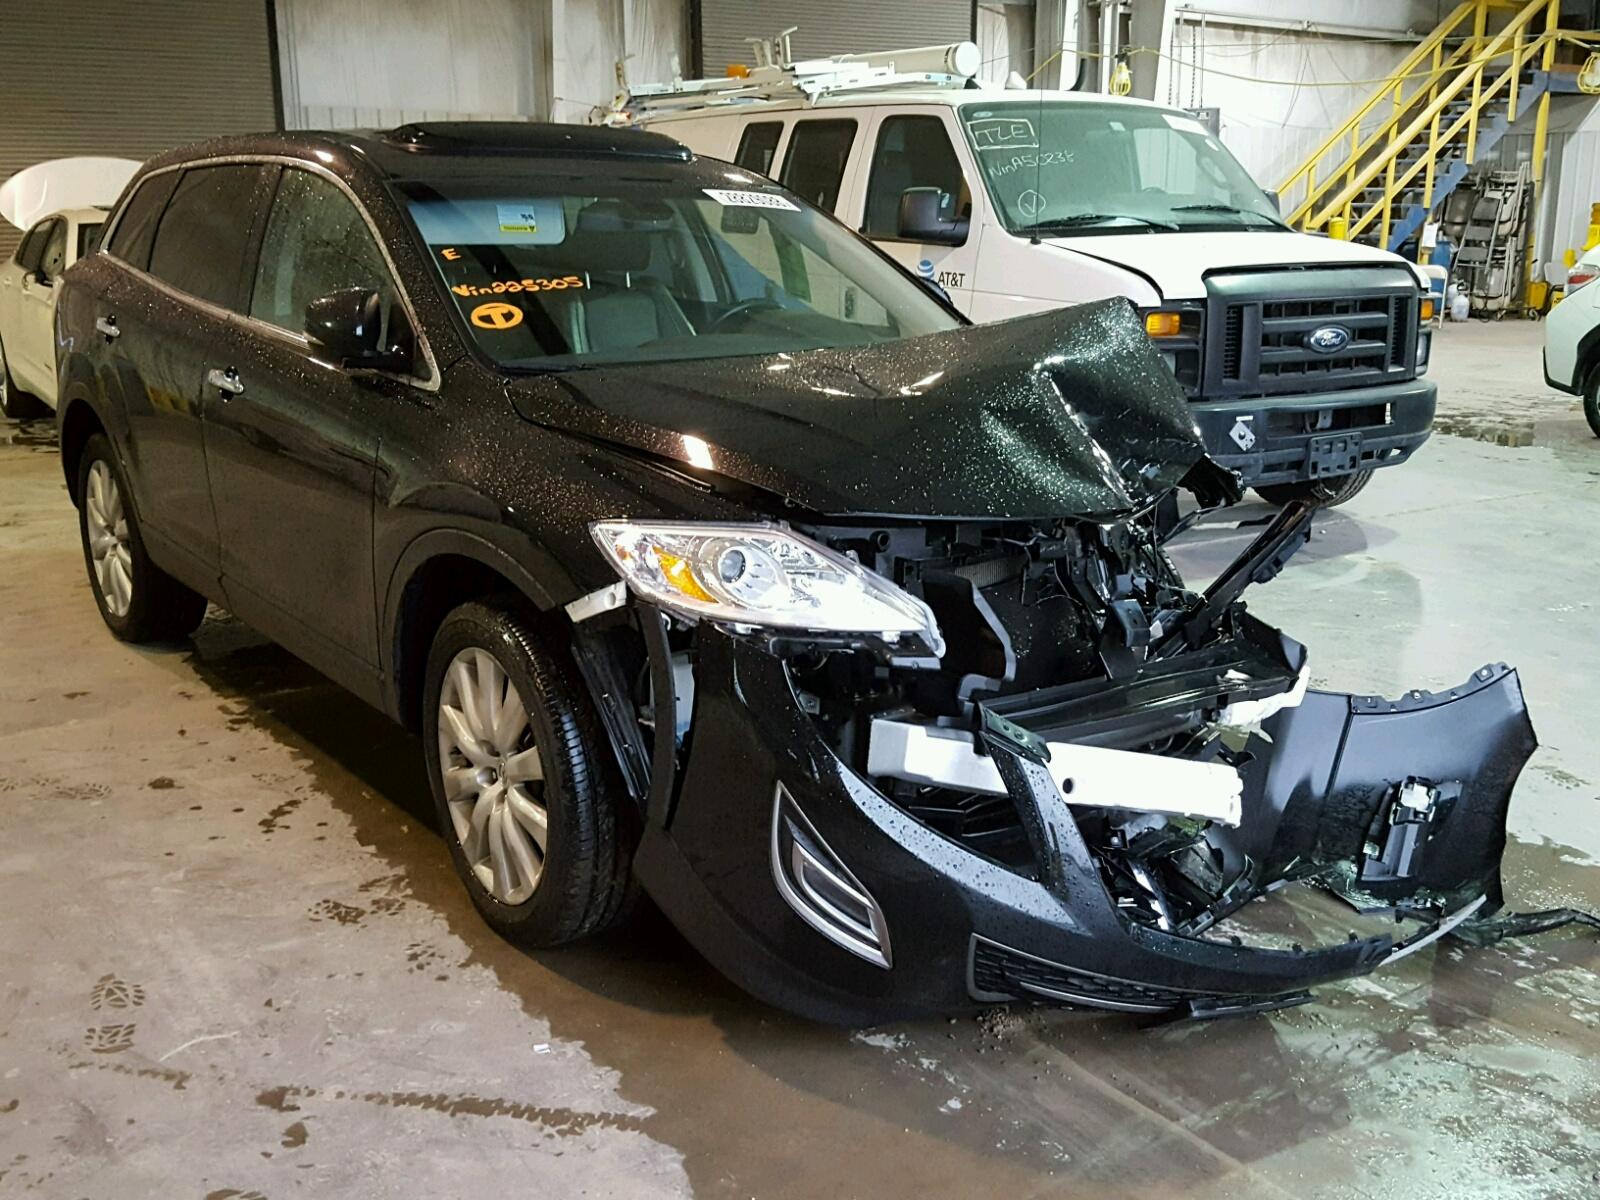 gallery judge dealership kansas chevrolet in dealers of tesla tosses mazda electric car lawsuit elegant against pany city